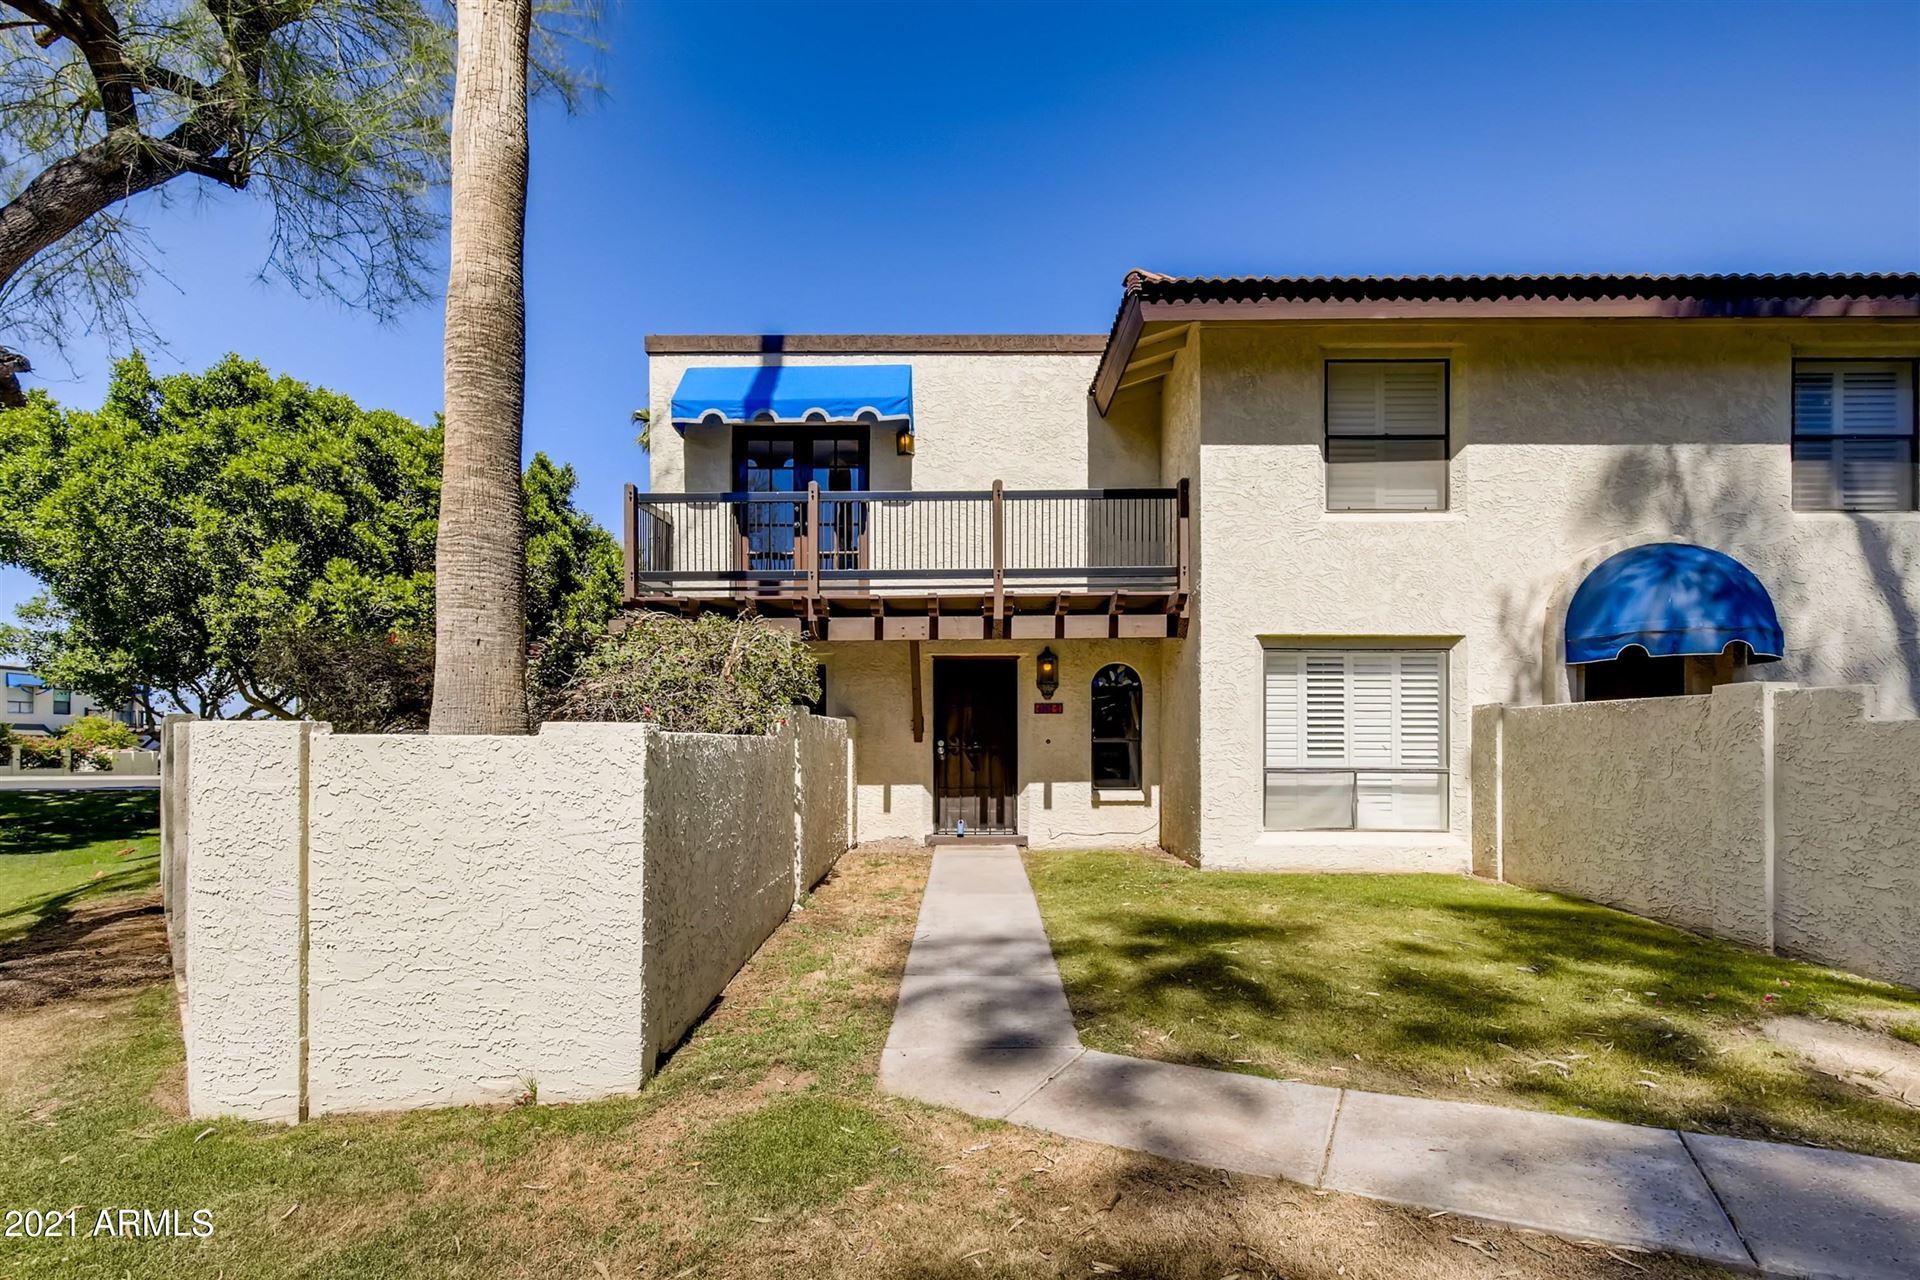 4852 E EUCLID Avenue #2, Phoenix, AZ 85044 - MLS#: 6237130